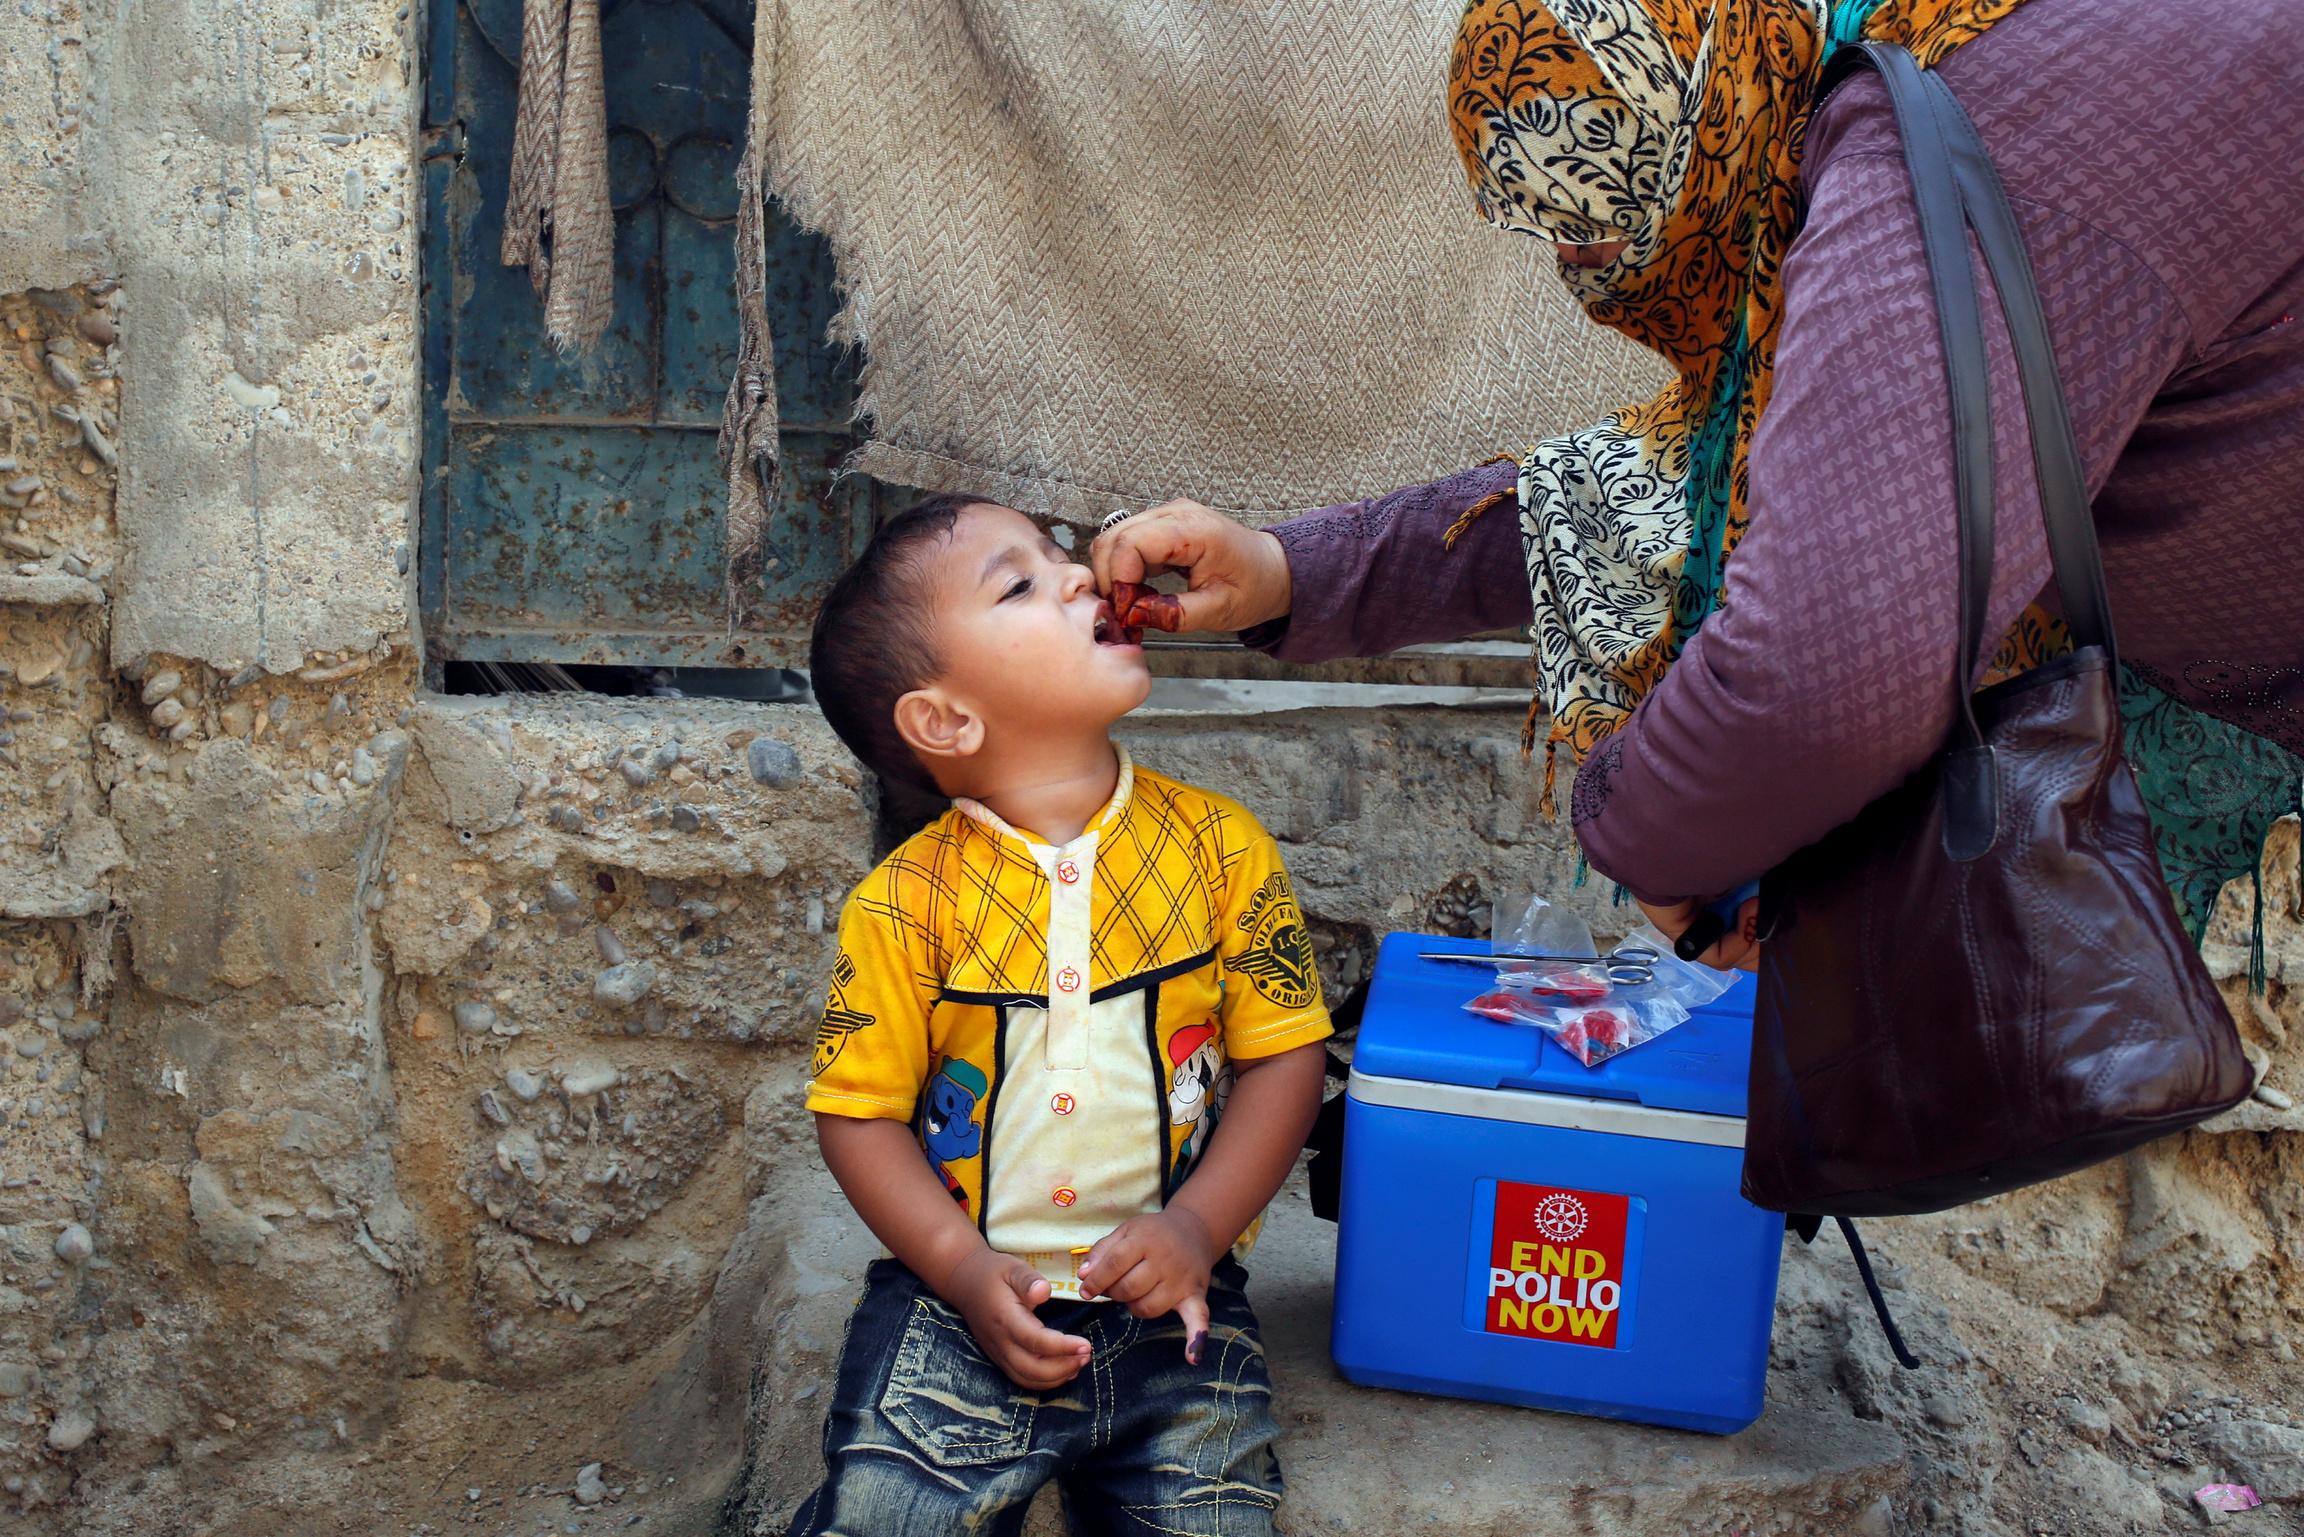 A woman gives a boy an oral polio vaccine.